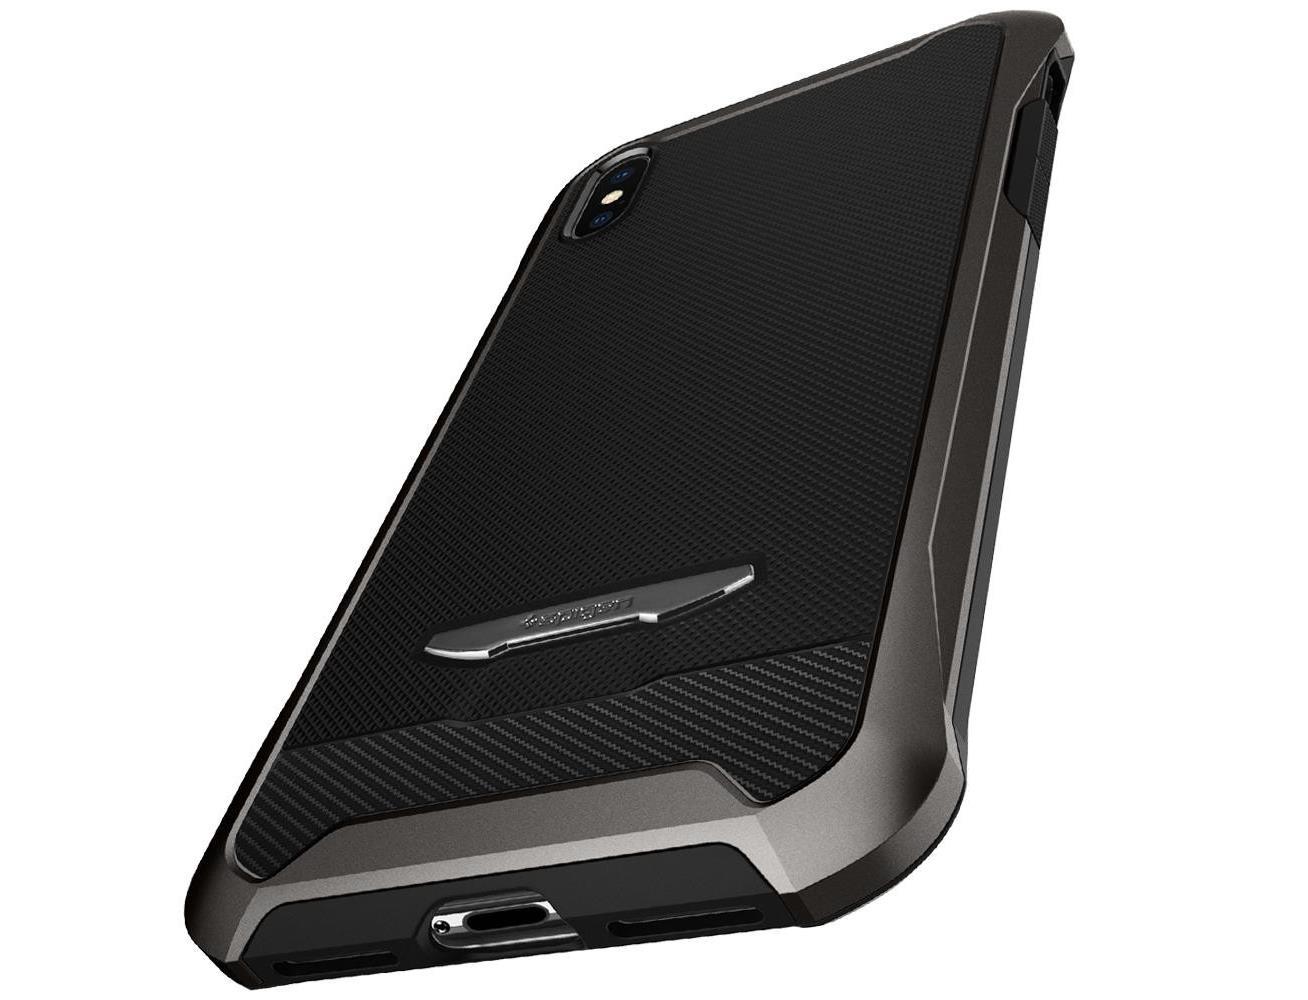 best service b10d2 5e255 Spigen Reventon Case for iPhone X/XS - Gunmetal| Blink Kuwait